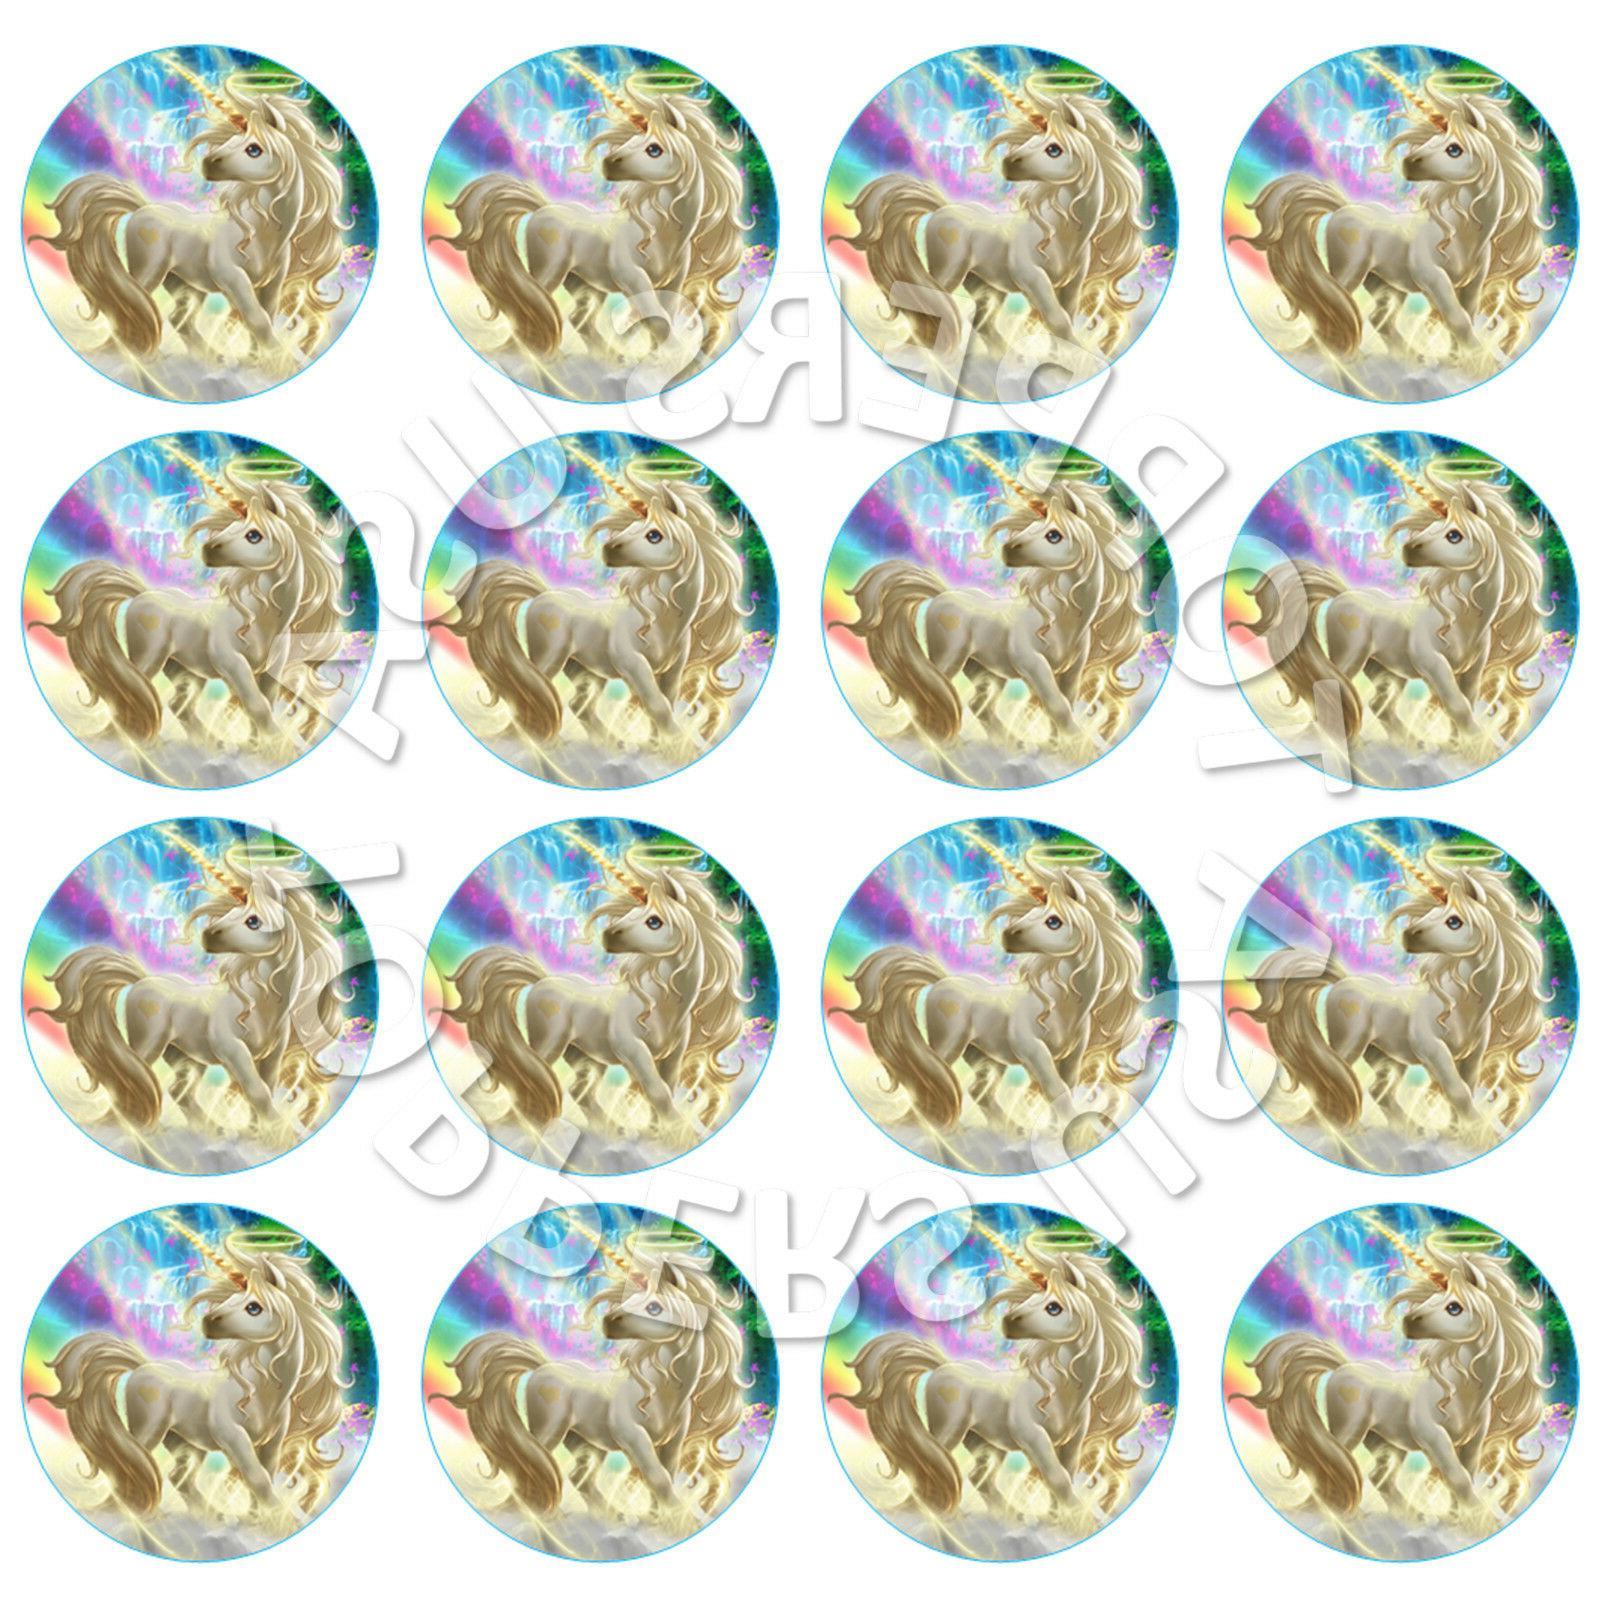 16x edible rainbow unicorn birthday cupcake toppers